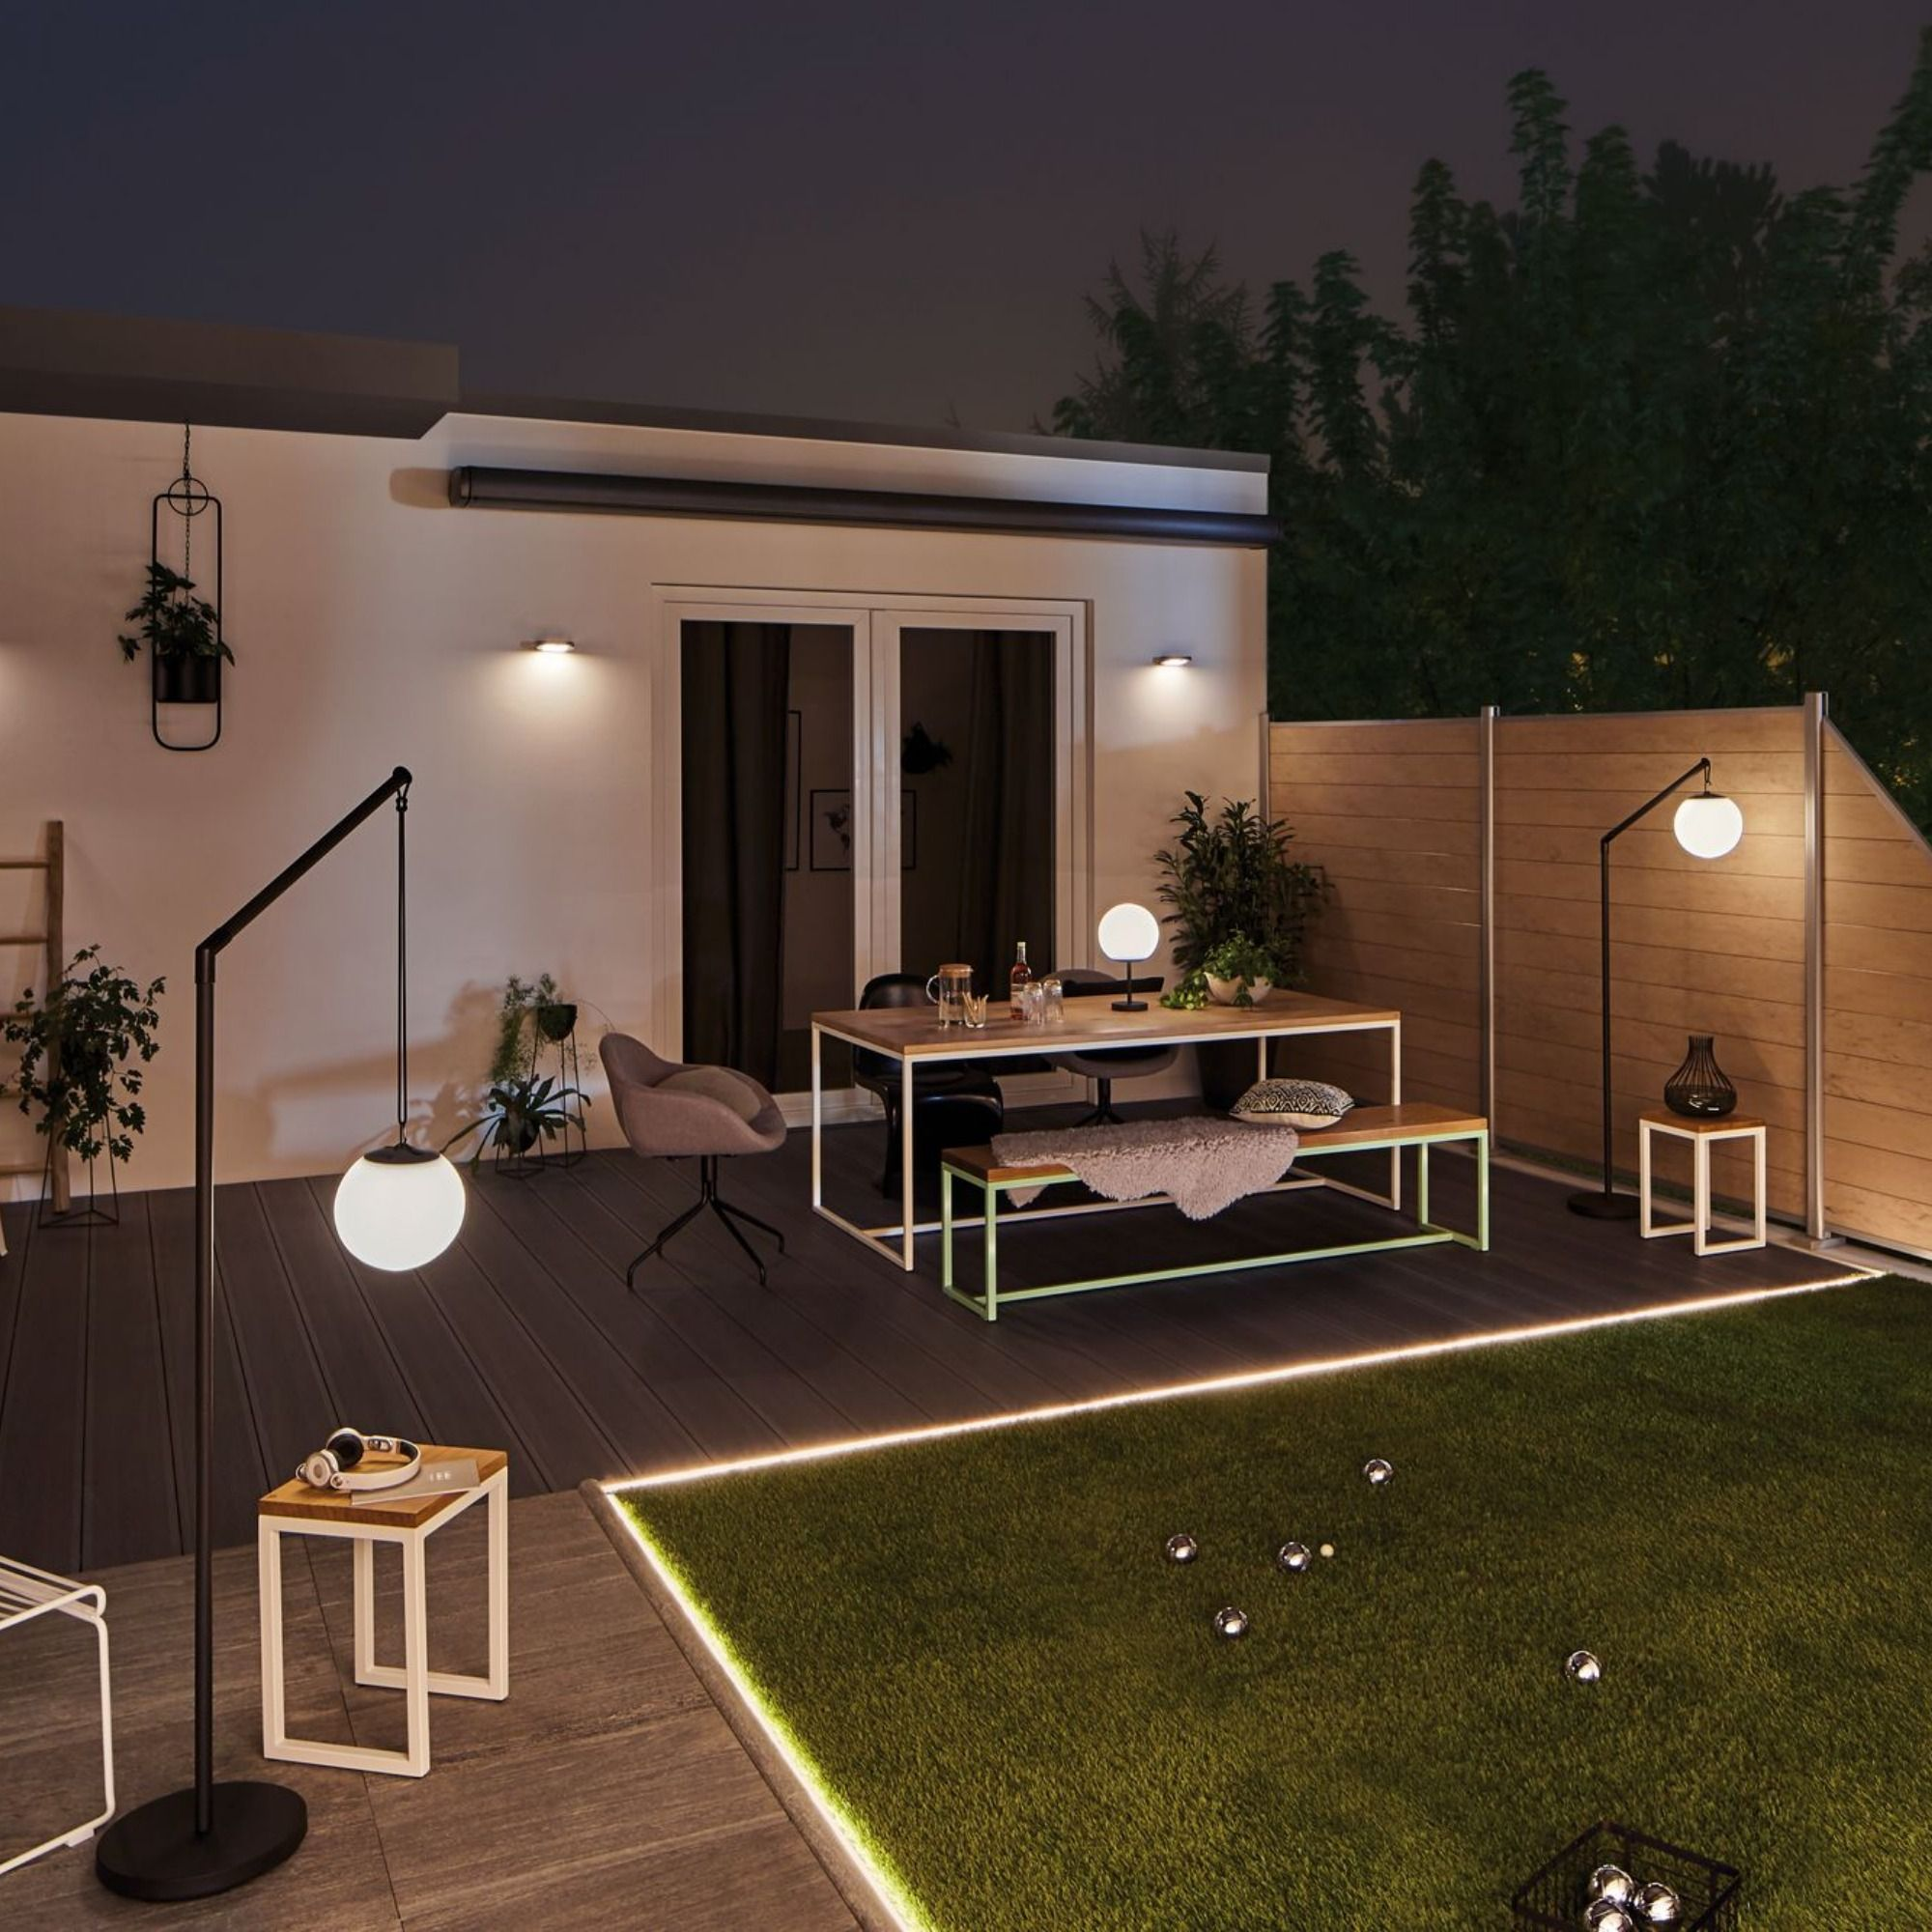 Terrassenbeleuchtung Solar   Solar patio lights, Solar patio ...